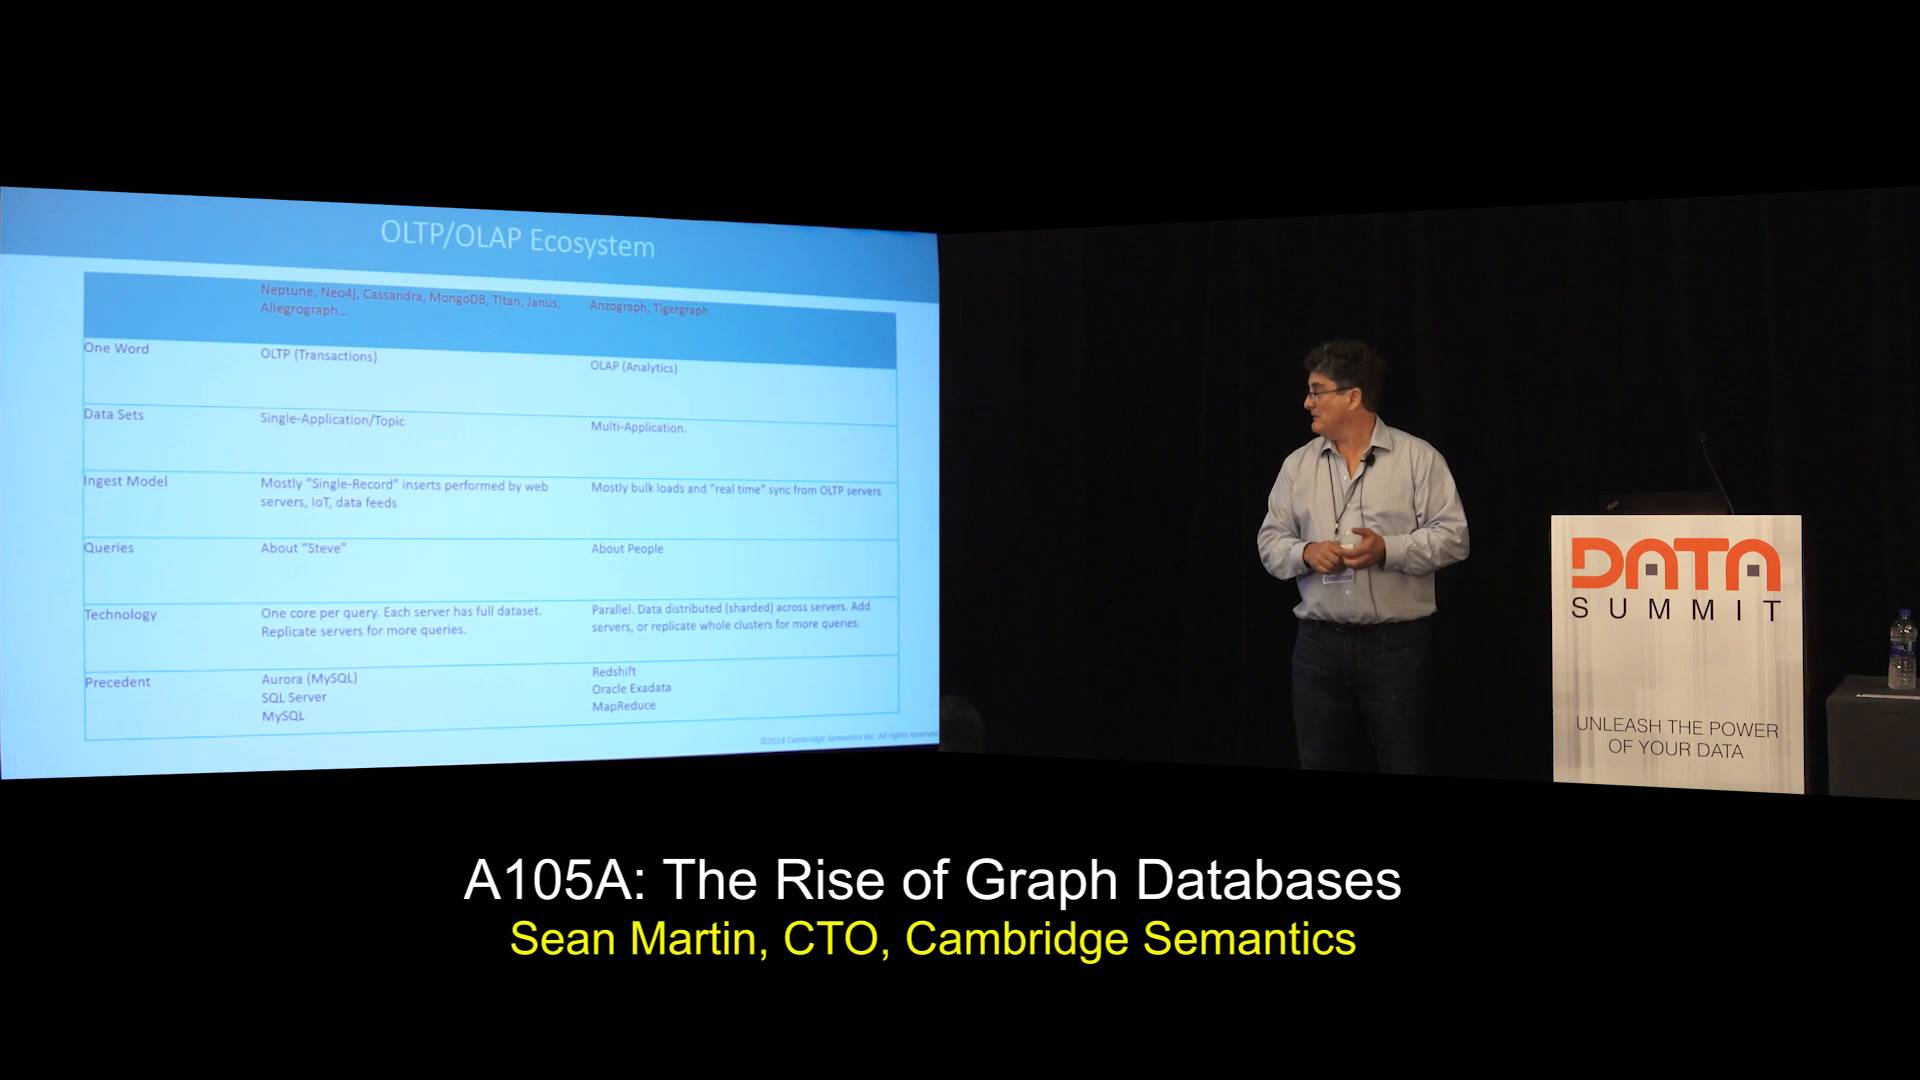 Sean Data Summit 2018